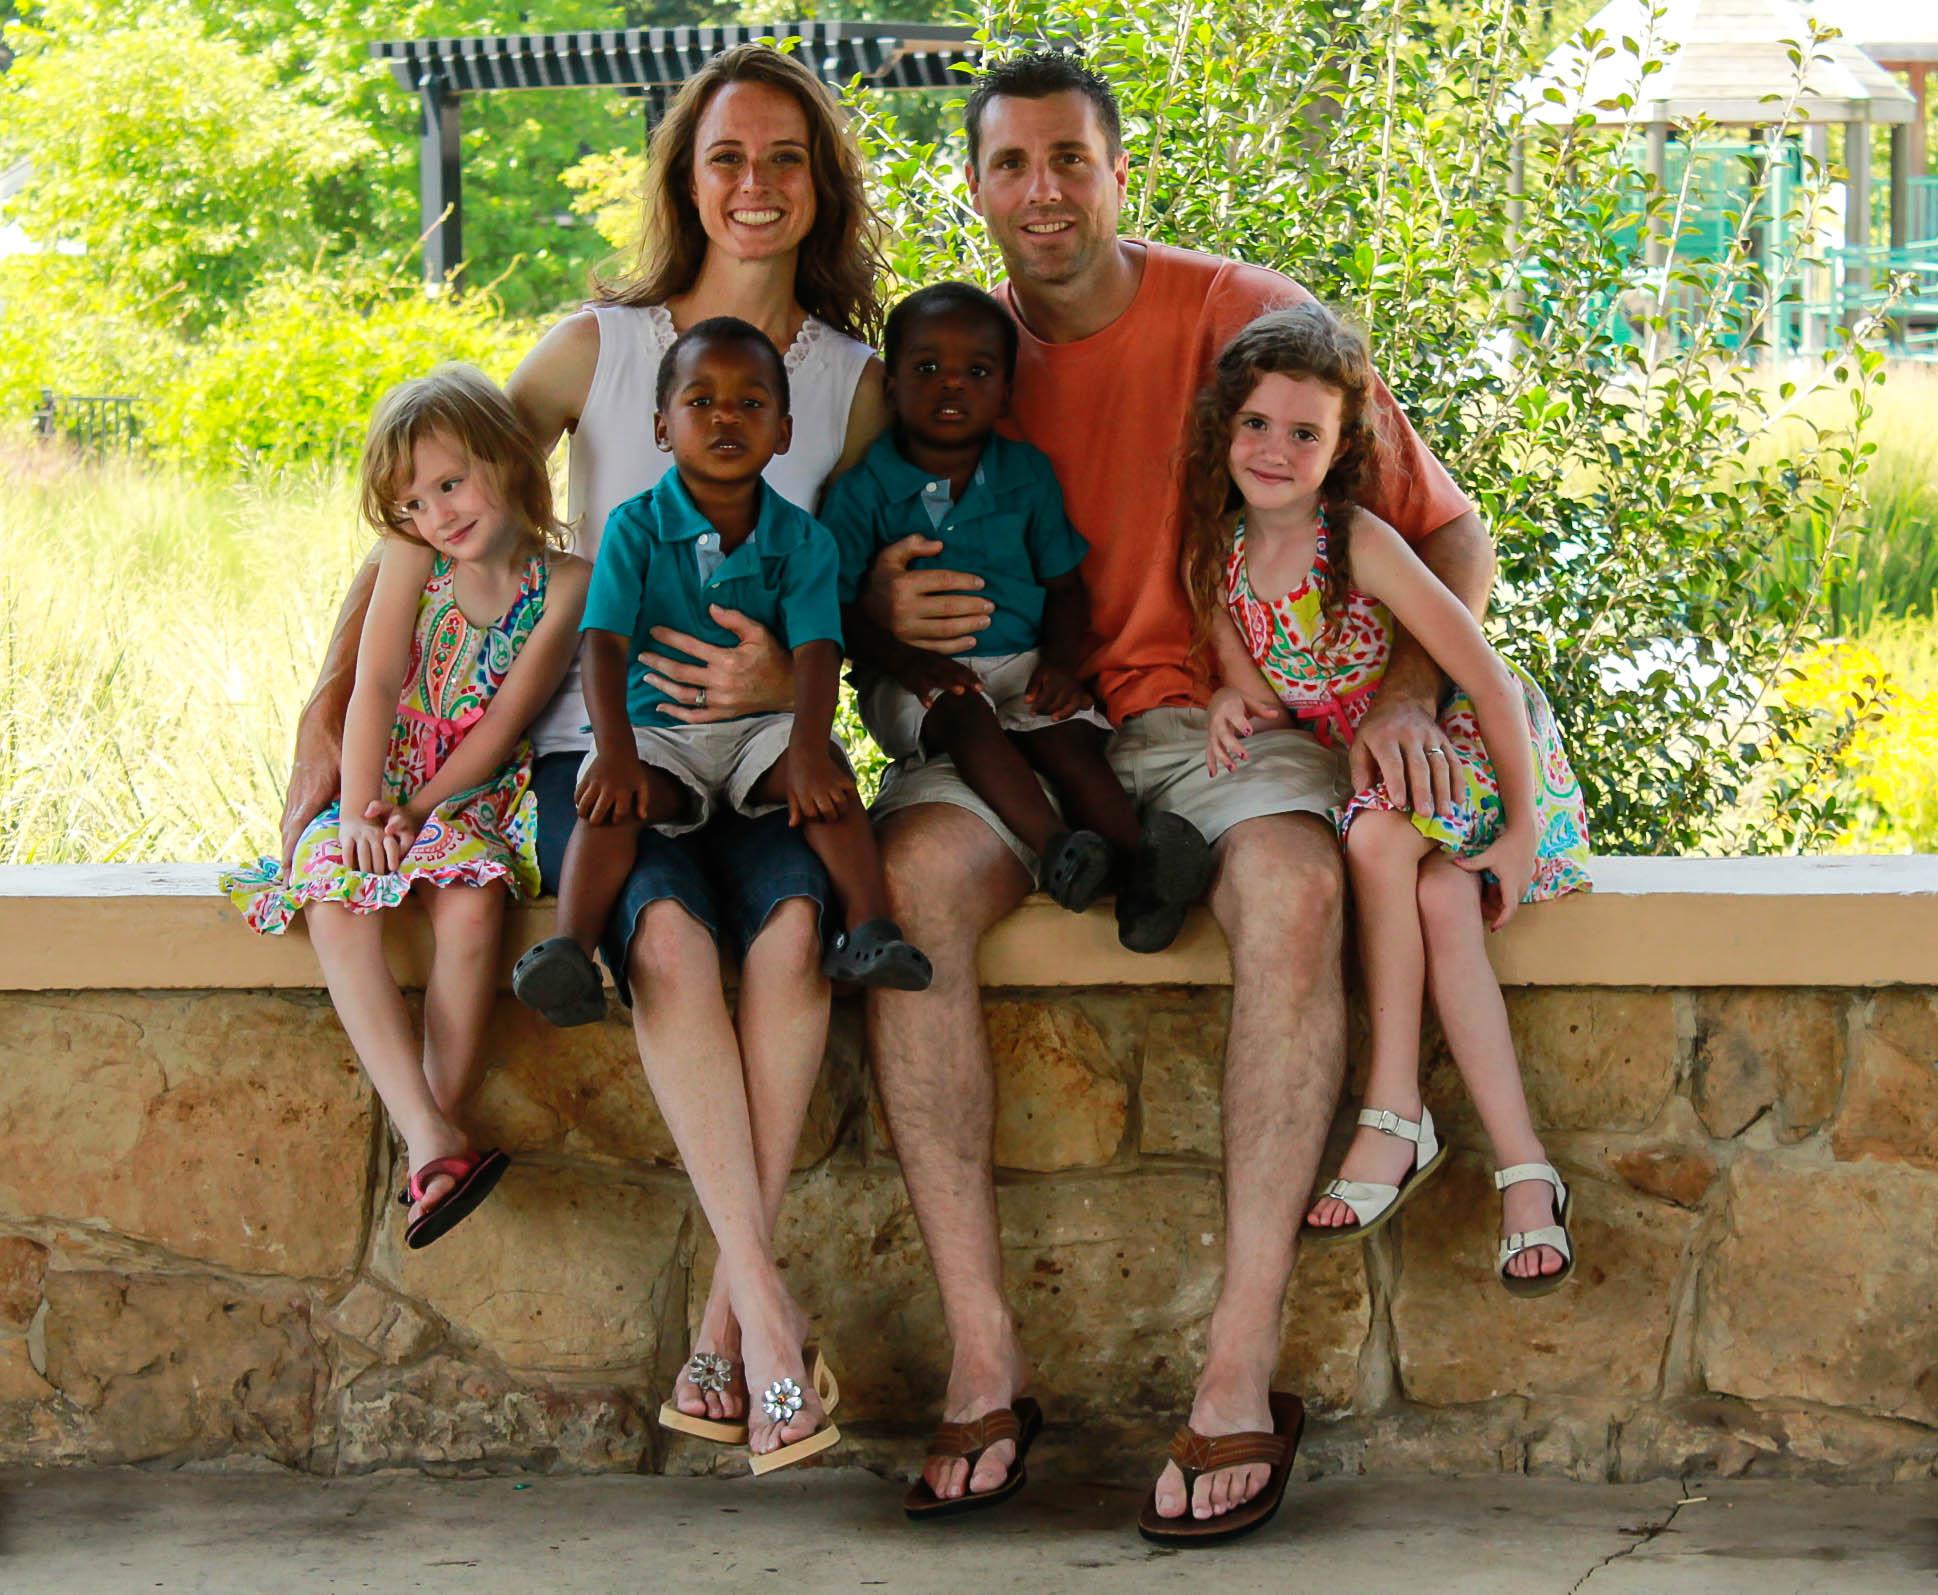 The Knotts Family